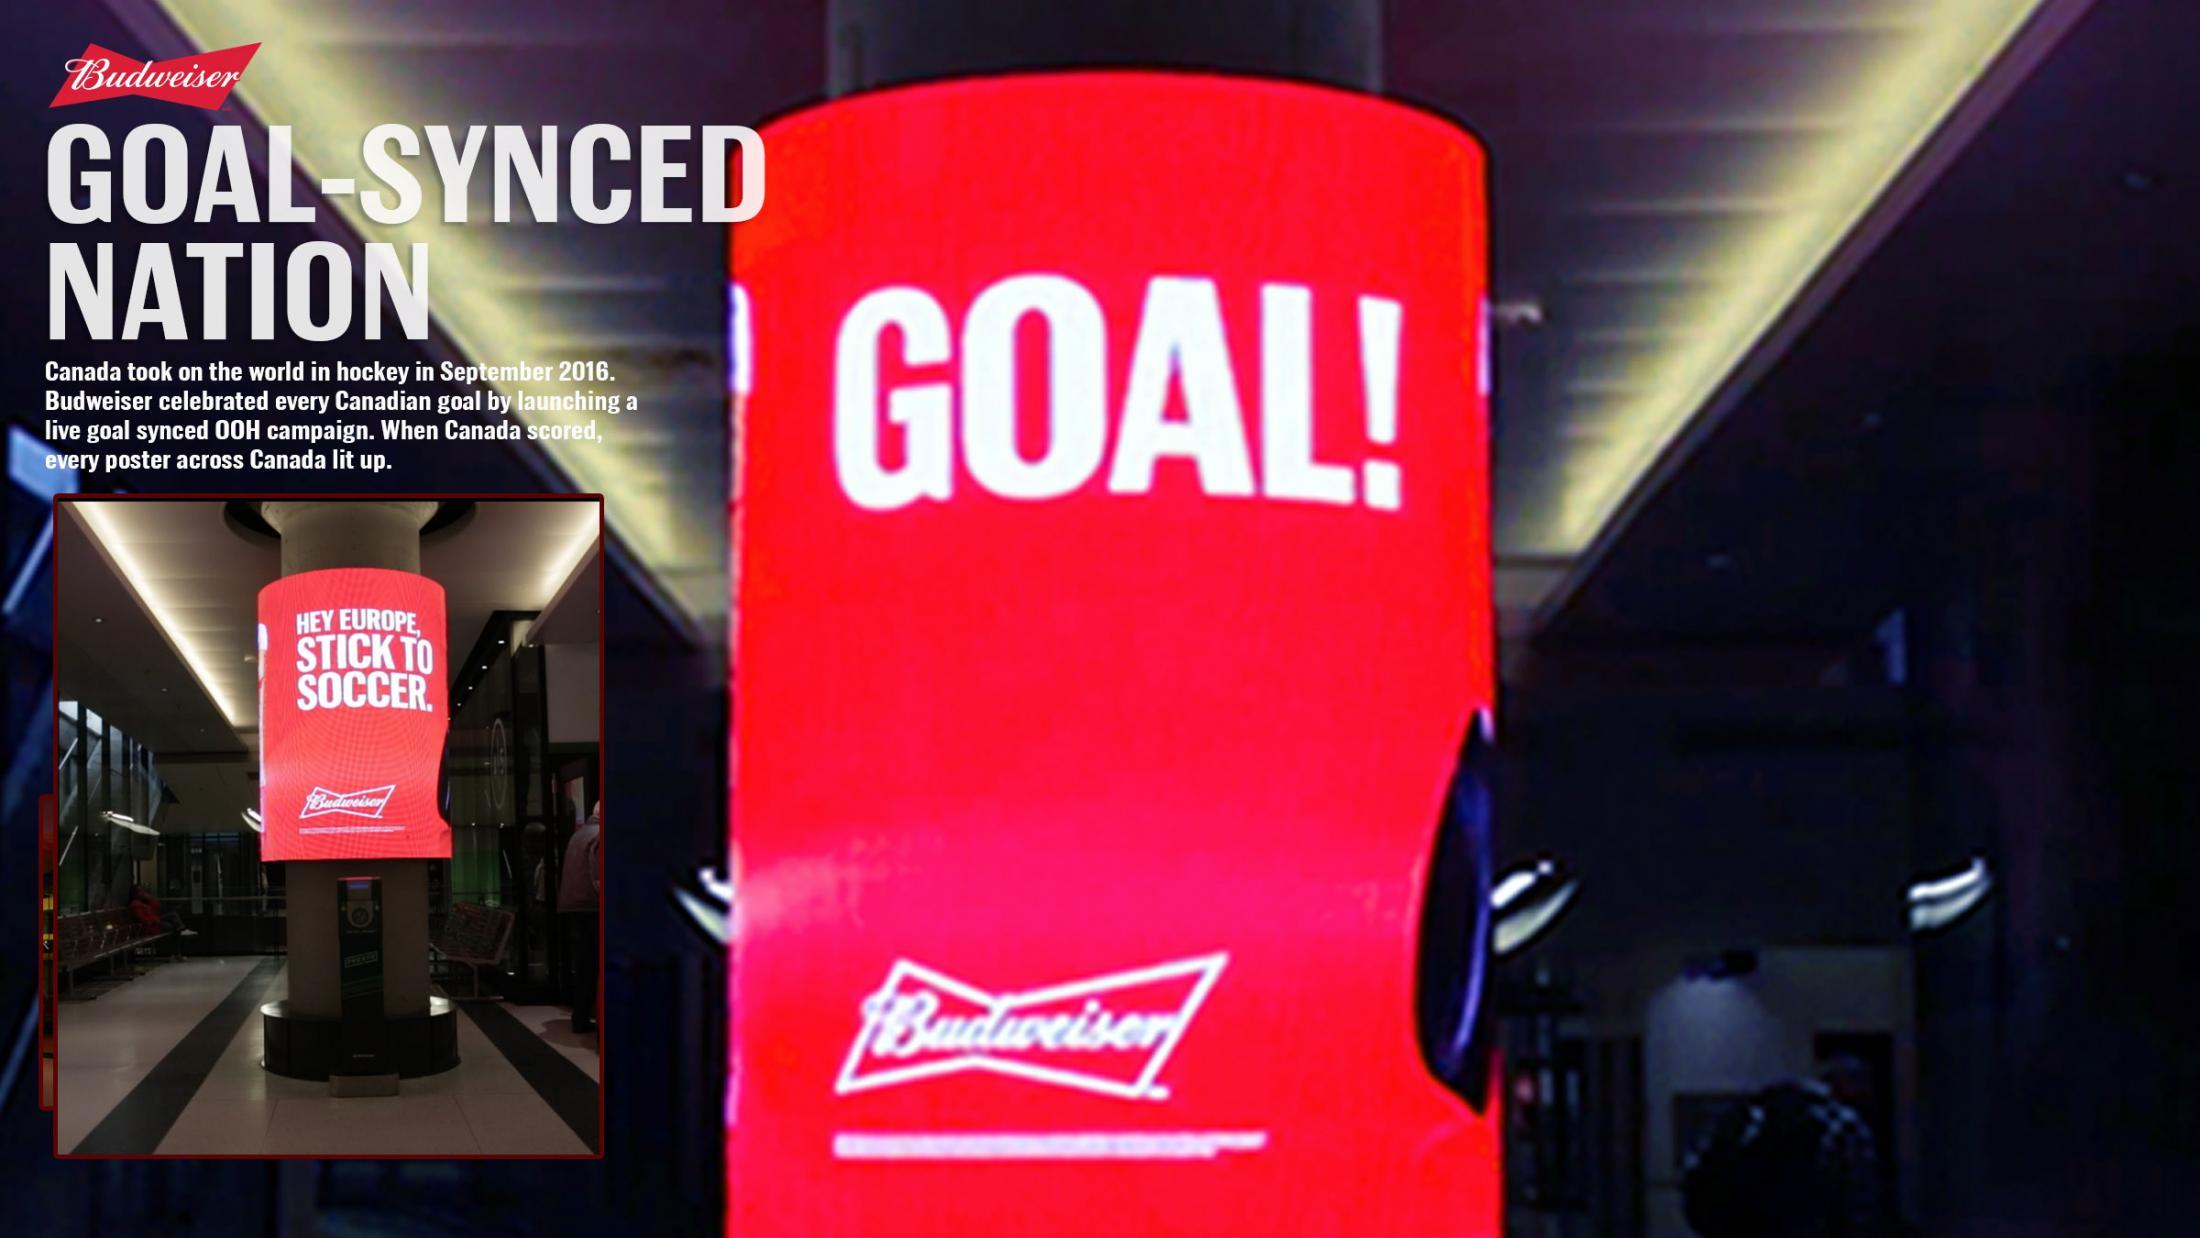 Thumbnail for Budweiser Goal-Synced Nation